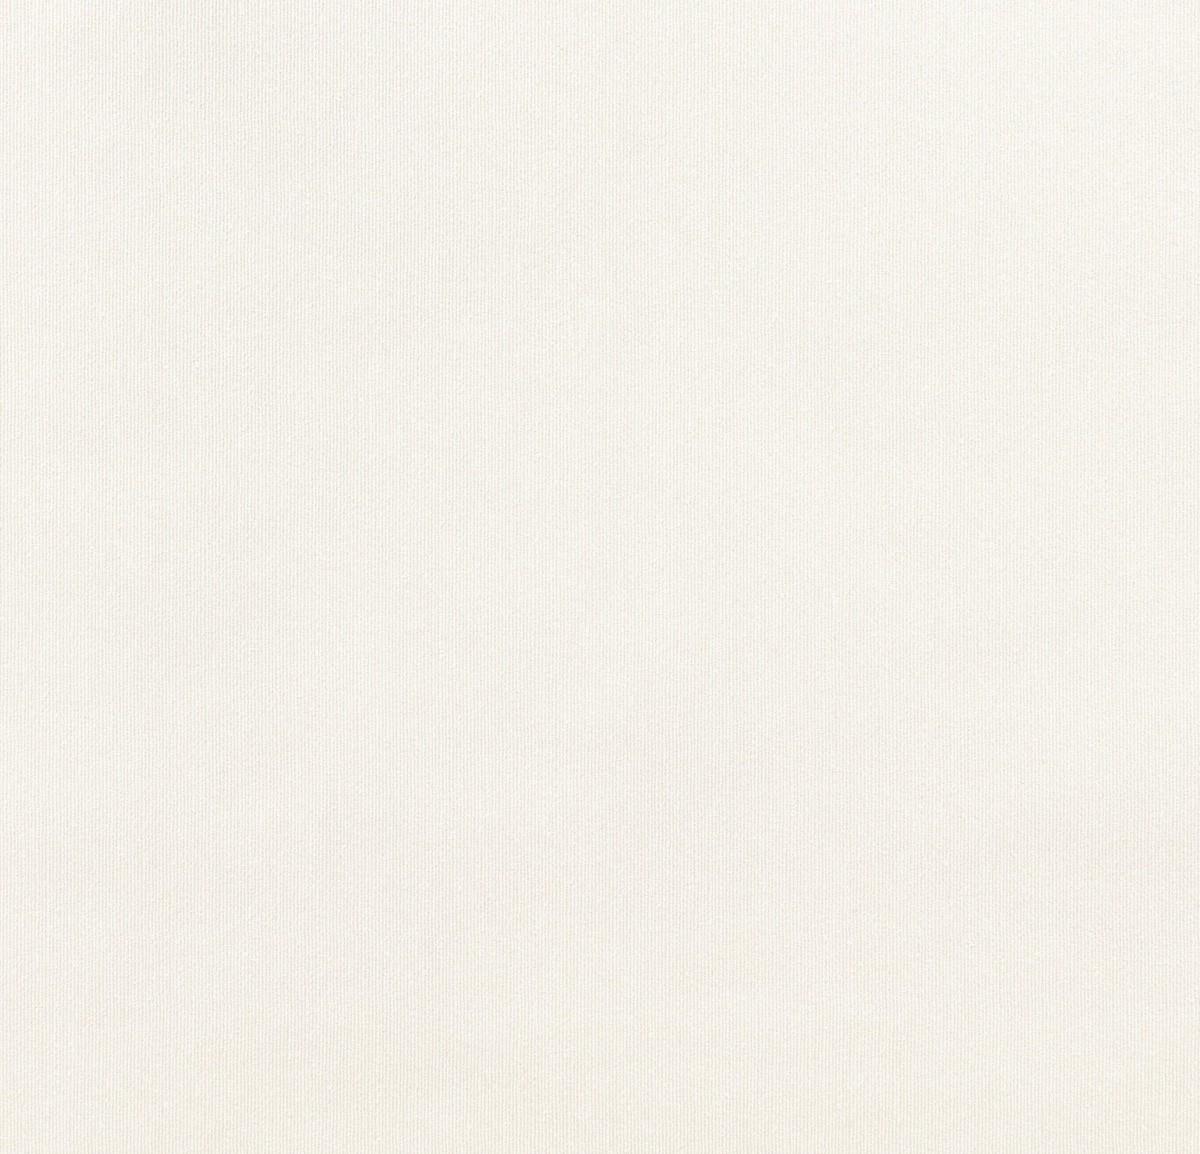 tapete uni creme 93578 1 935781 ok 5 vliestapete a s. Black Bedroom Furniture Sets. Home Design Ideas